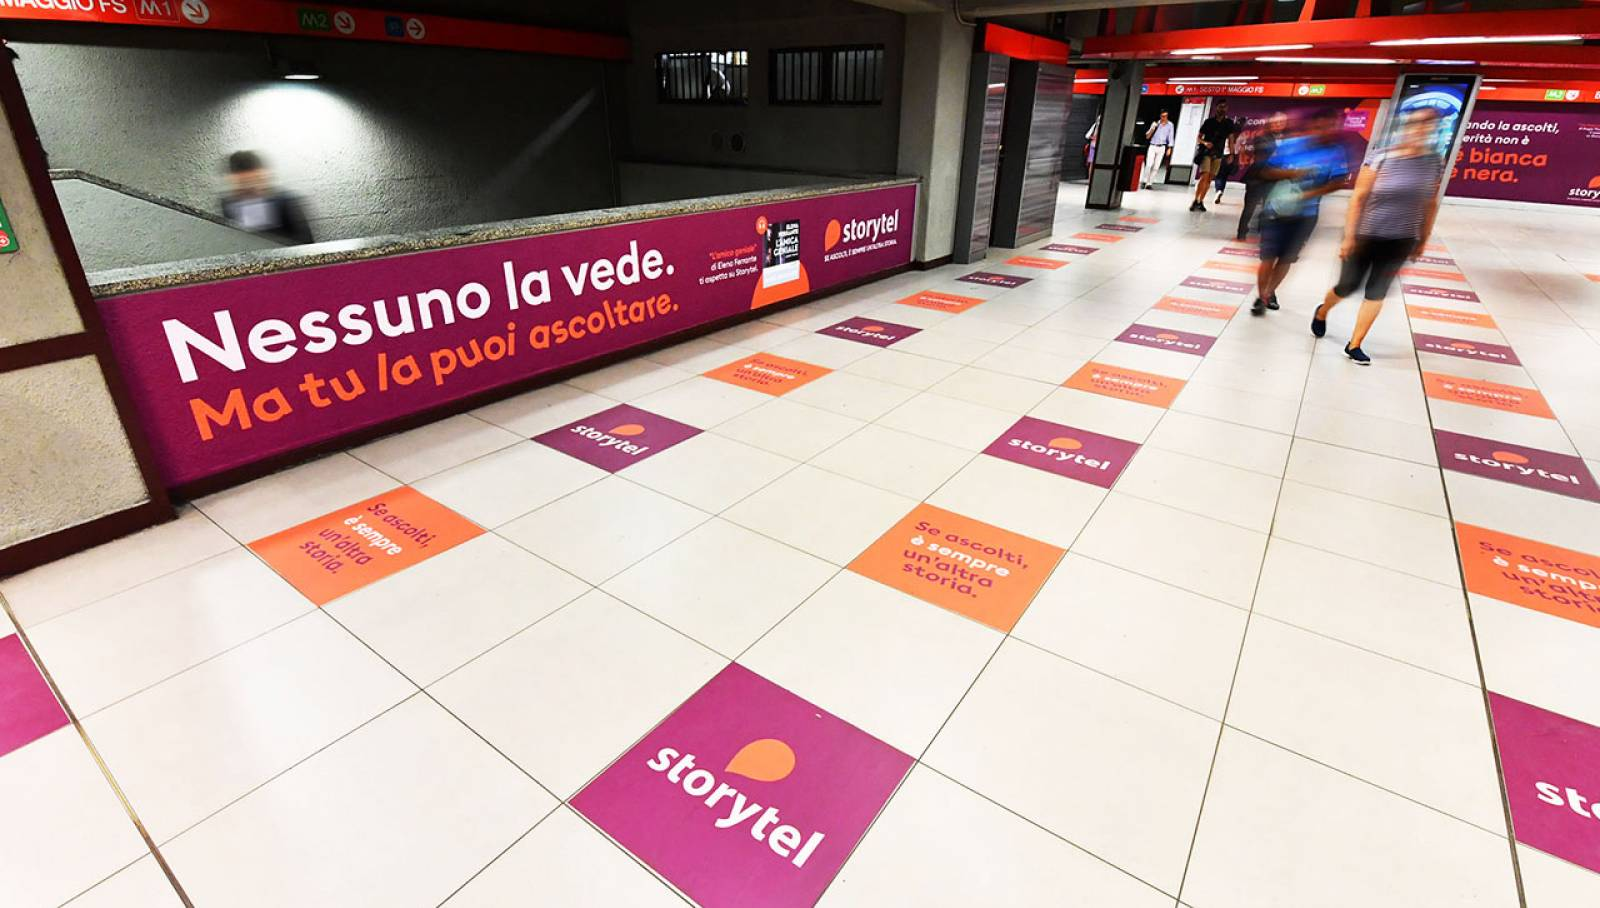 Pubblicità metro milanese Station Domination IGPDecaux per Storytel